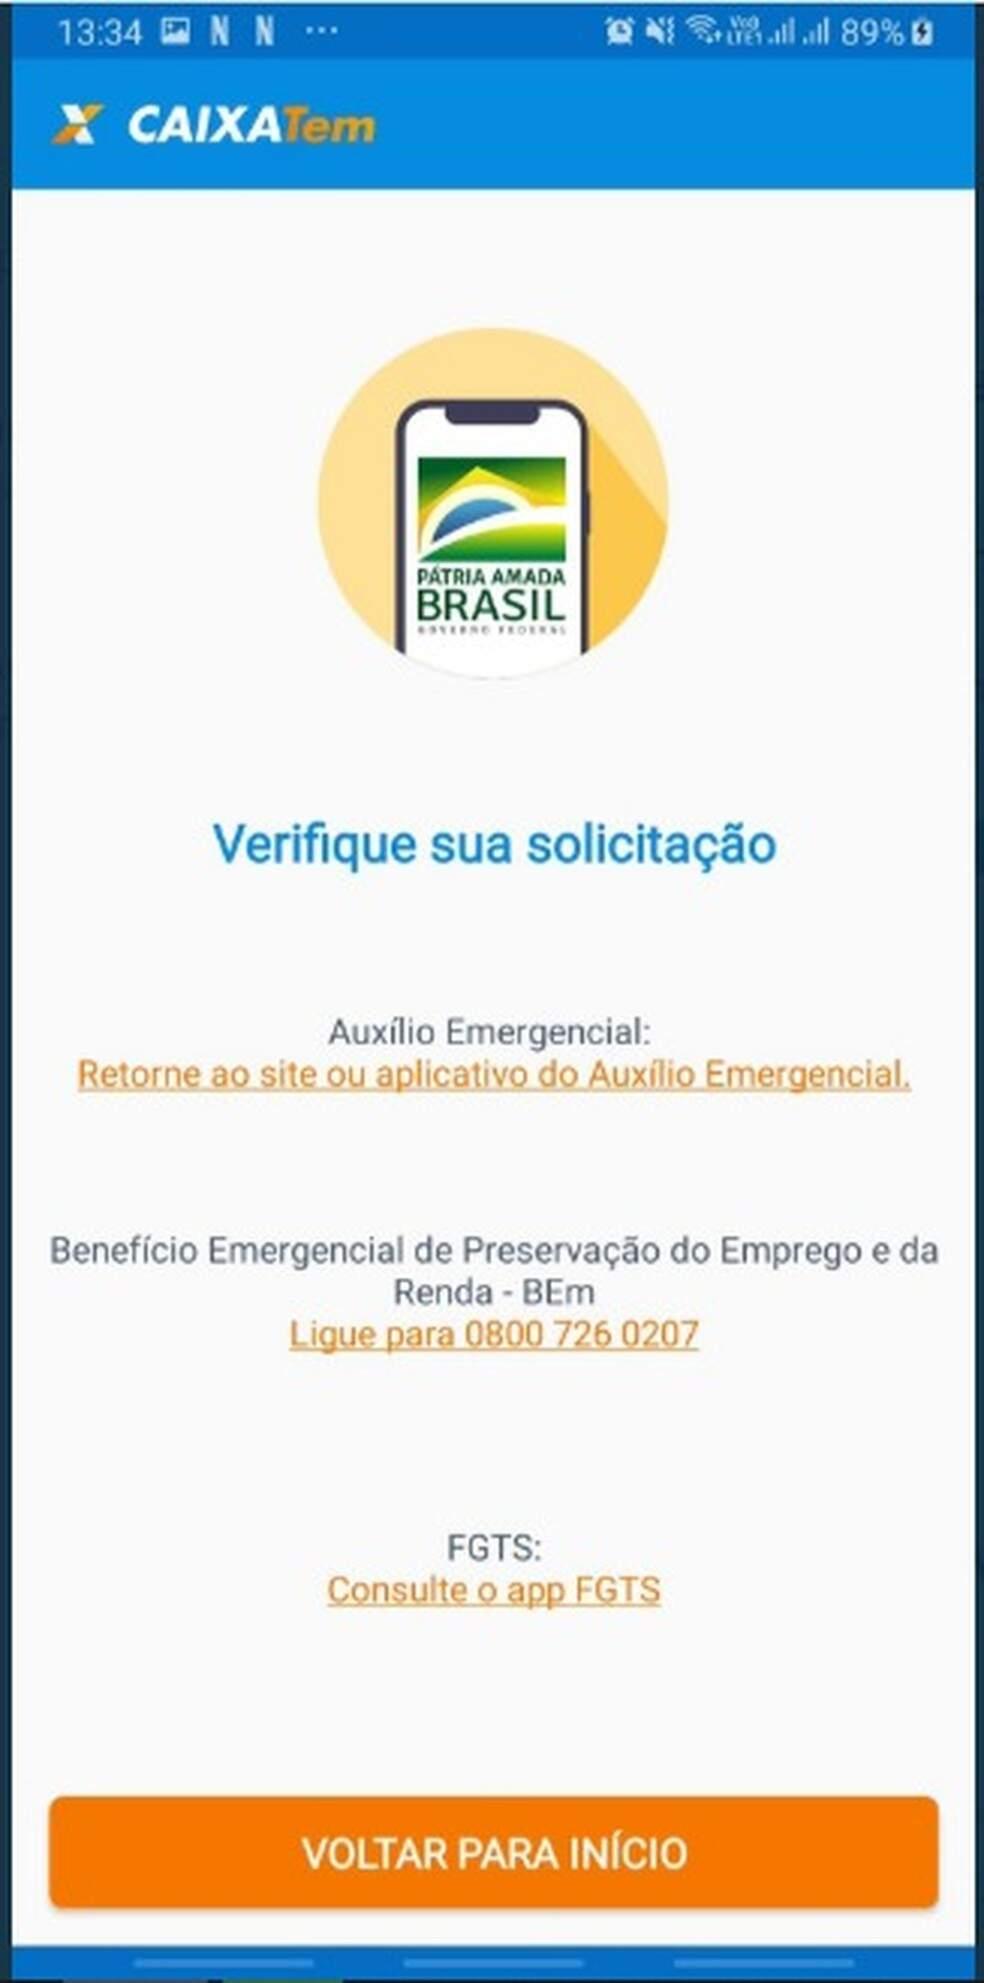 Whatsapp Image 2020 07 20 At 14.11.32 - Abrir Empresa Simples